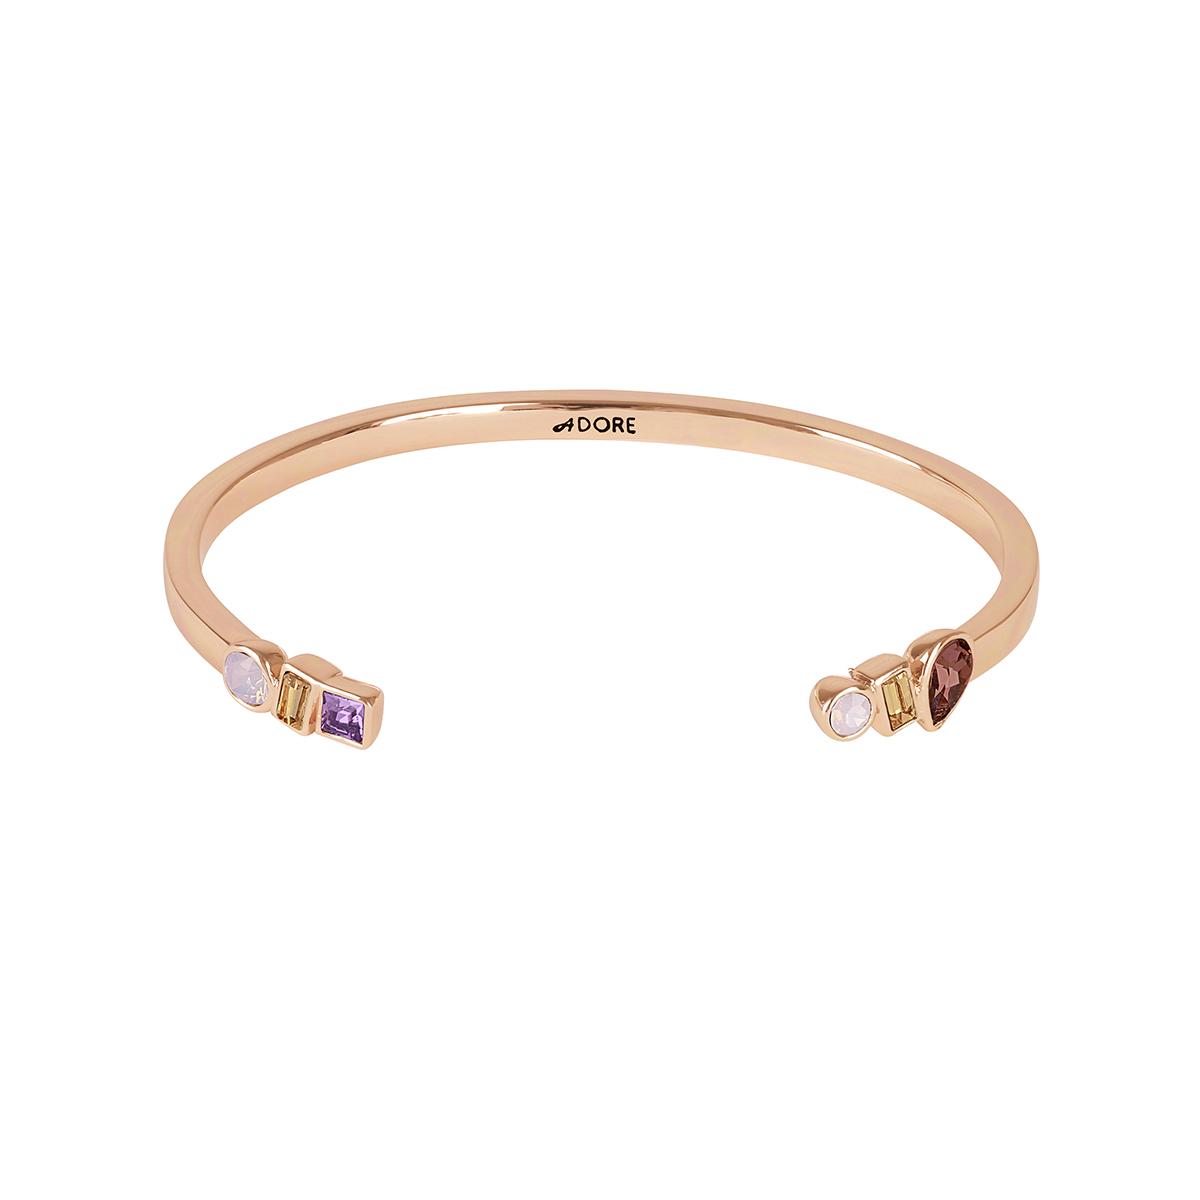 4ac6cc8a5 ADORE Bar Bracelet Art. Nr.: 5495525. EUR 49,00